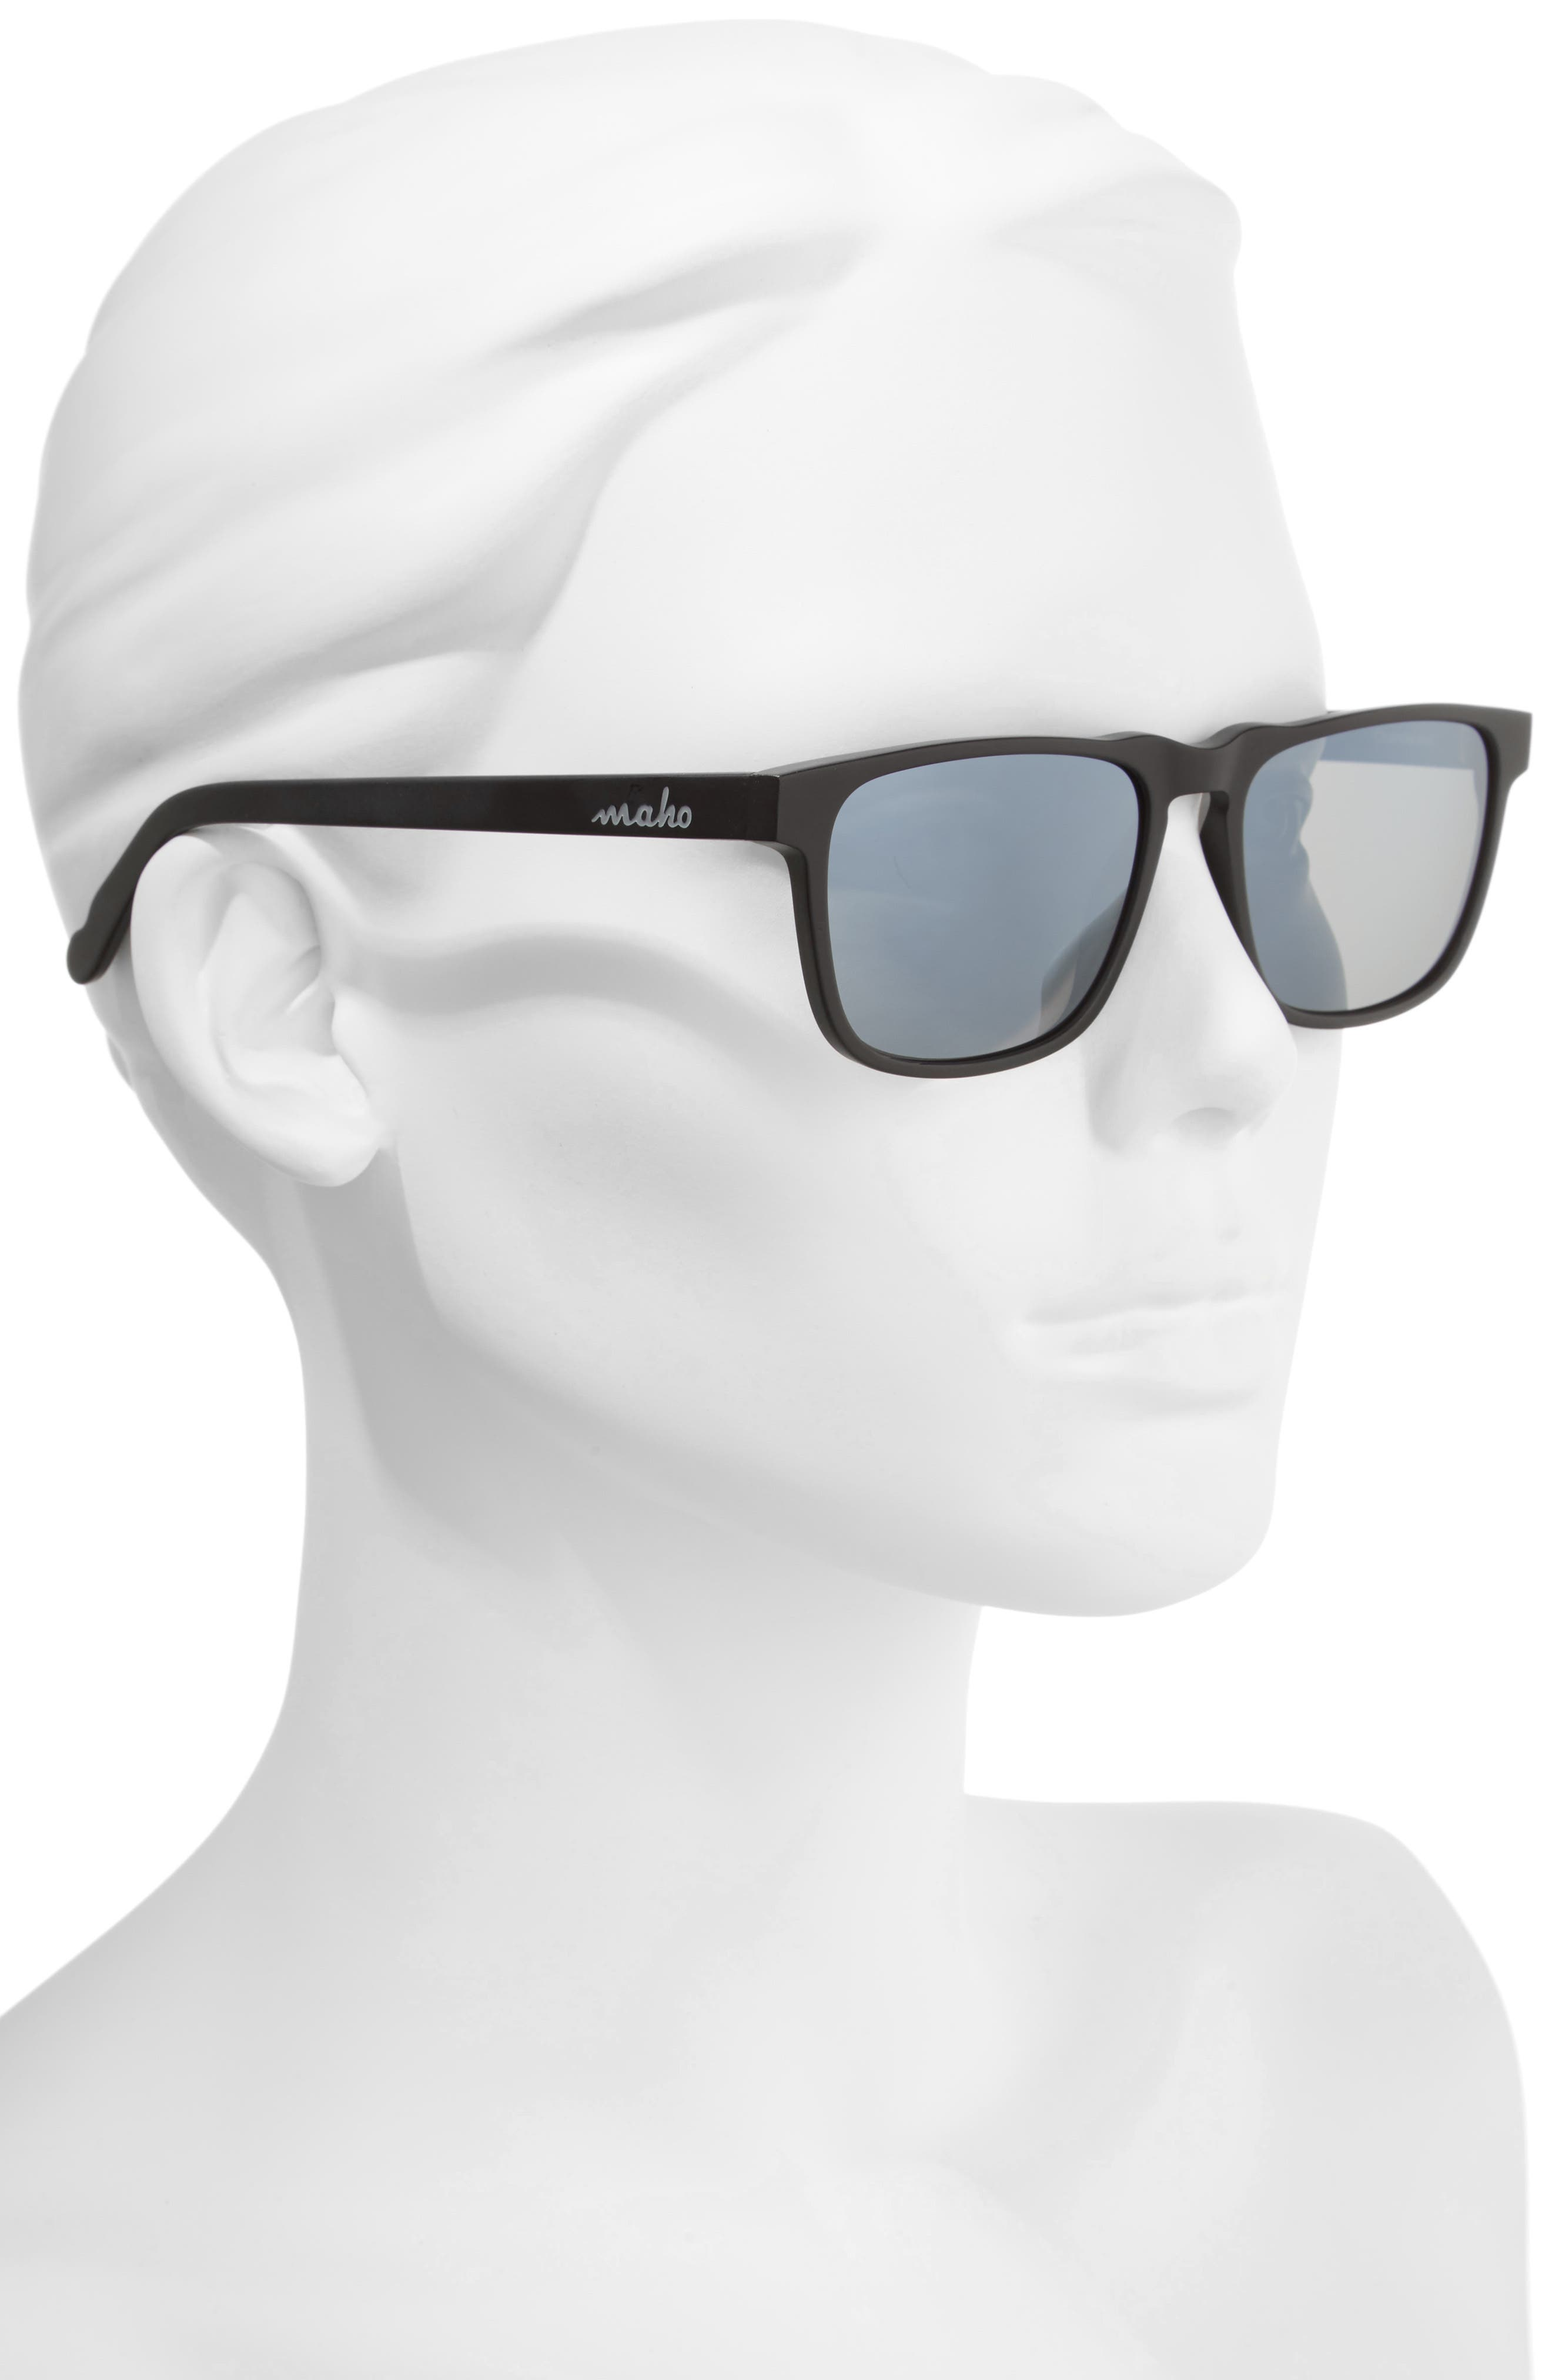 Alternate Image 2  - Maho Chandeleur 59mm Polarized Aviator Sunglasses